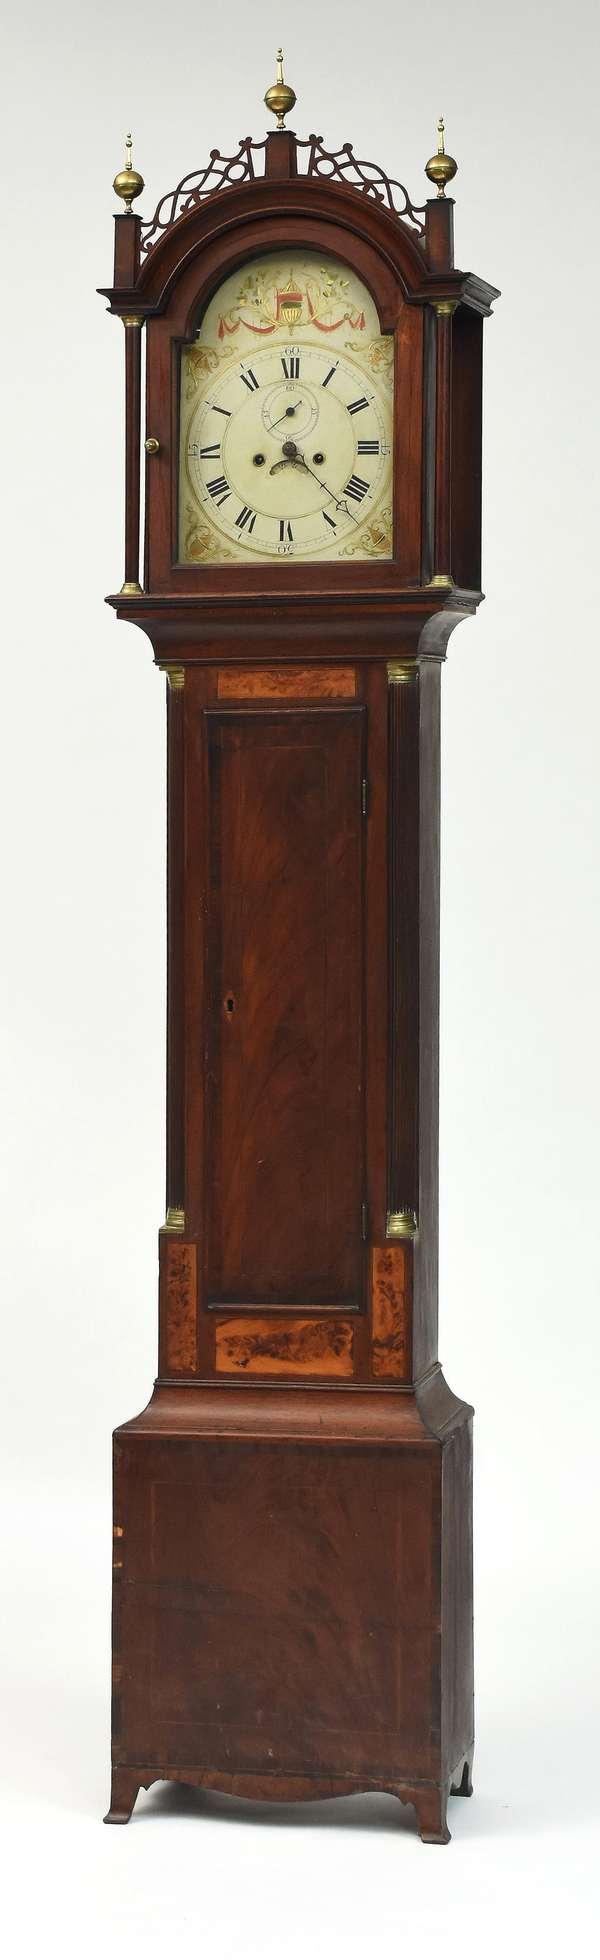 Fine Federal MA inlaid mahogany tall clock, brass works, Roxbury case with feathered birch inlaid panels, ca.1800, 93